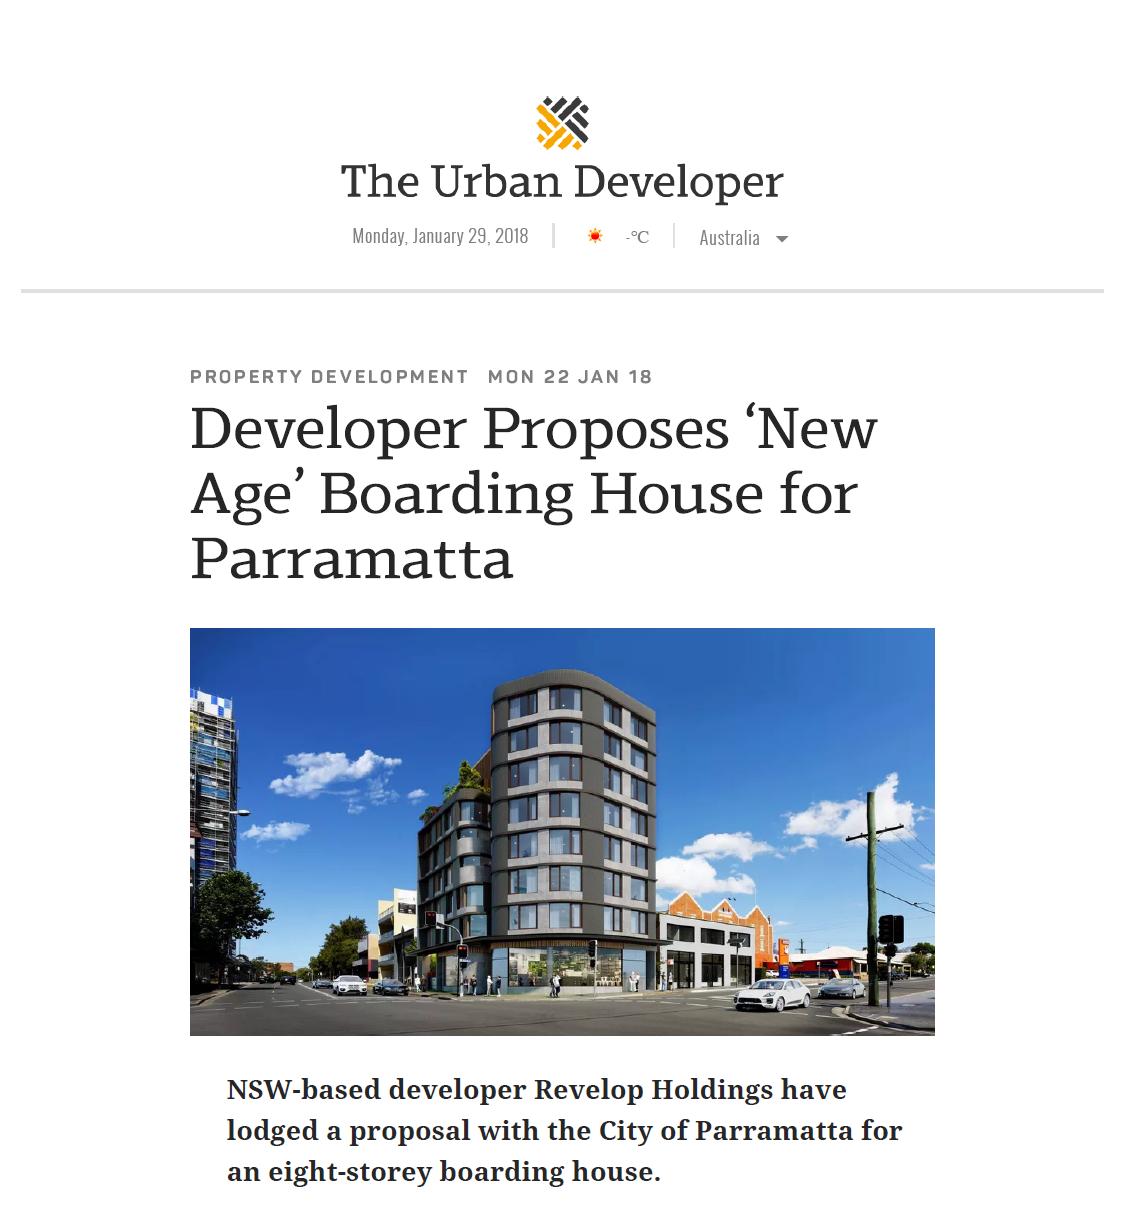 Developer Proposes 'New Age' Boarding House for Parramatta